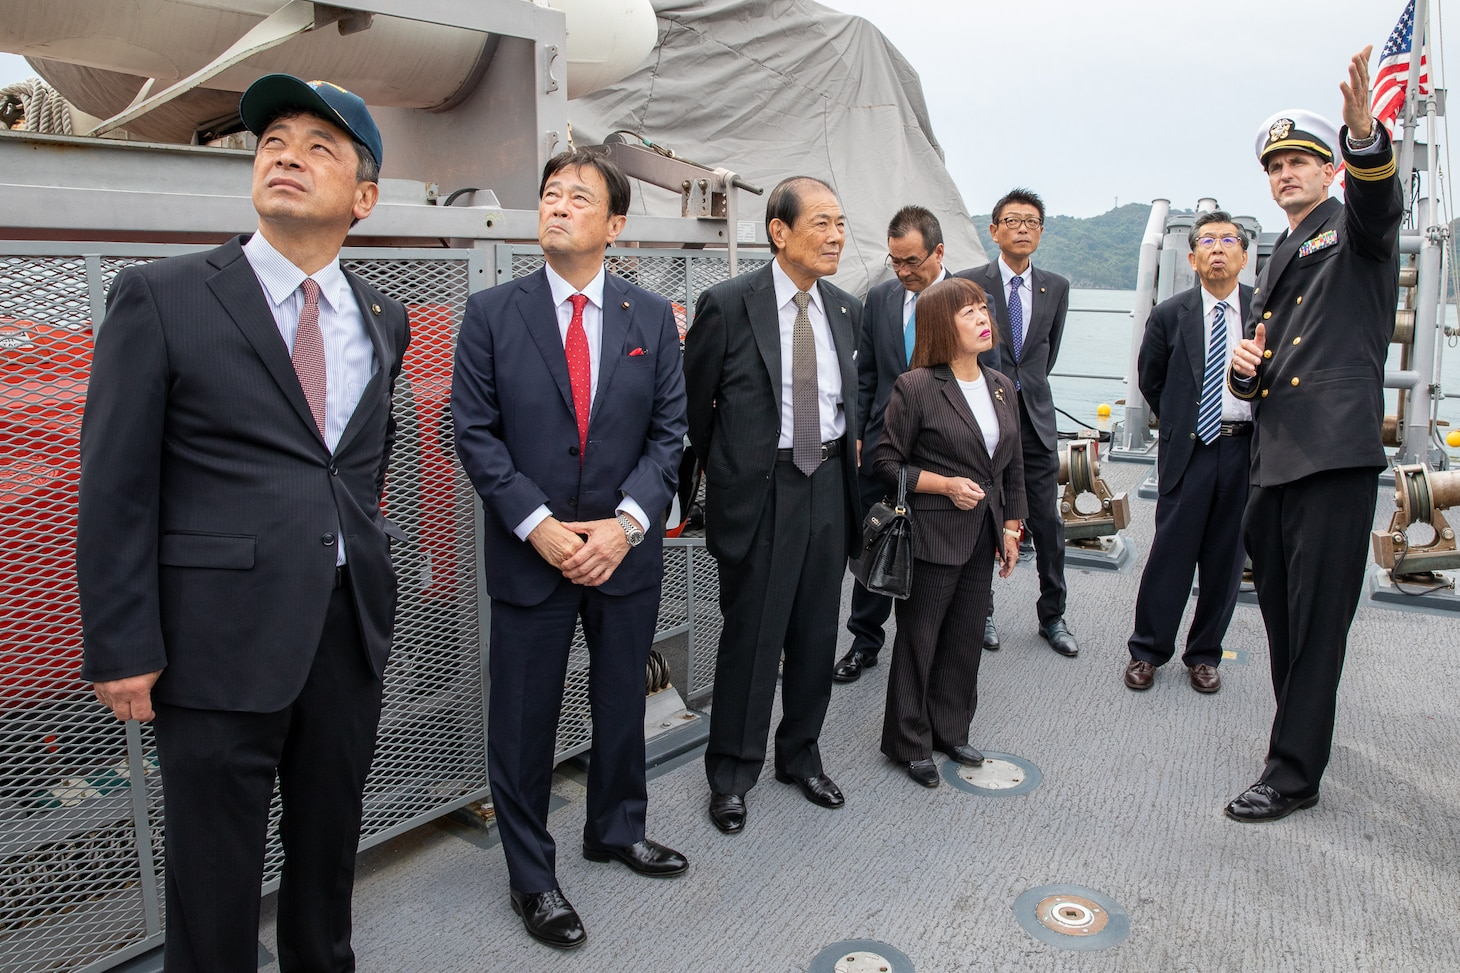 Lt. Cmdr. Bobby Wayland, gives a ship tour to the mayor of Uki city, Kenshi Morita and his staff.